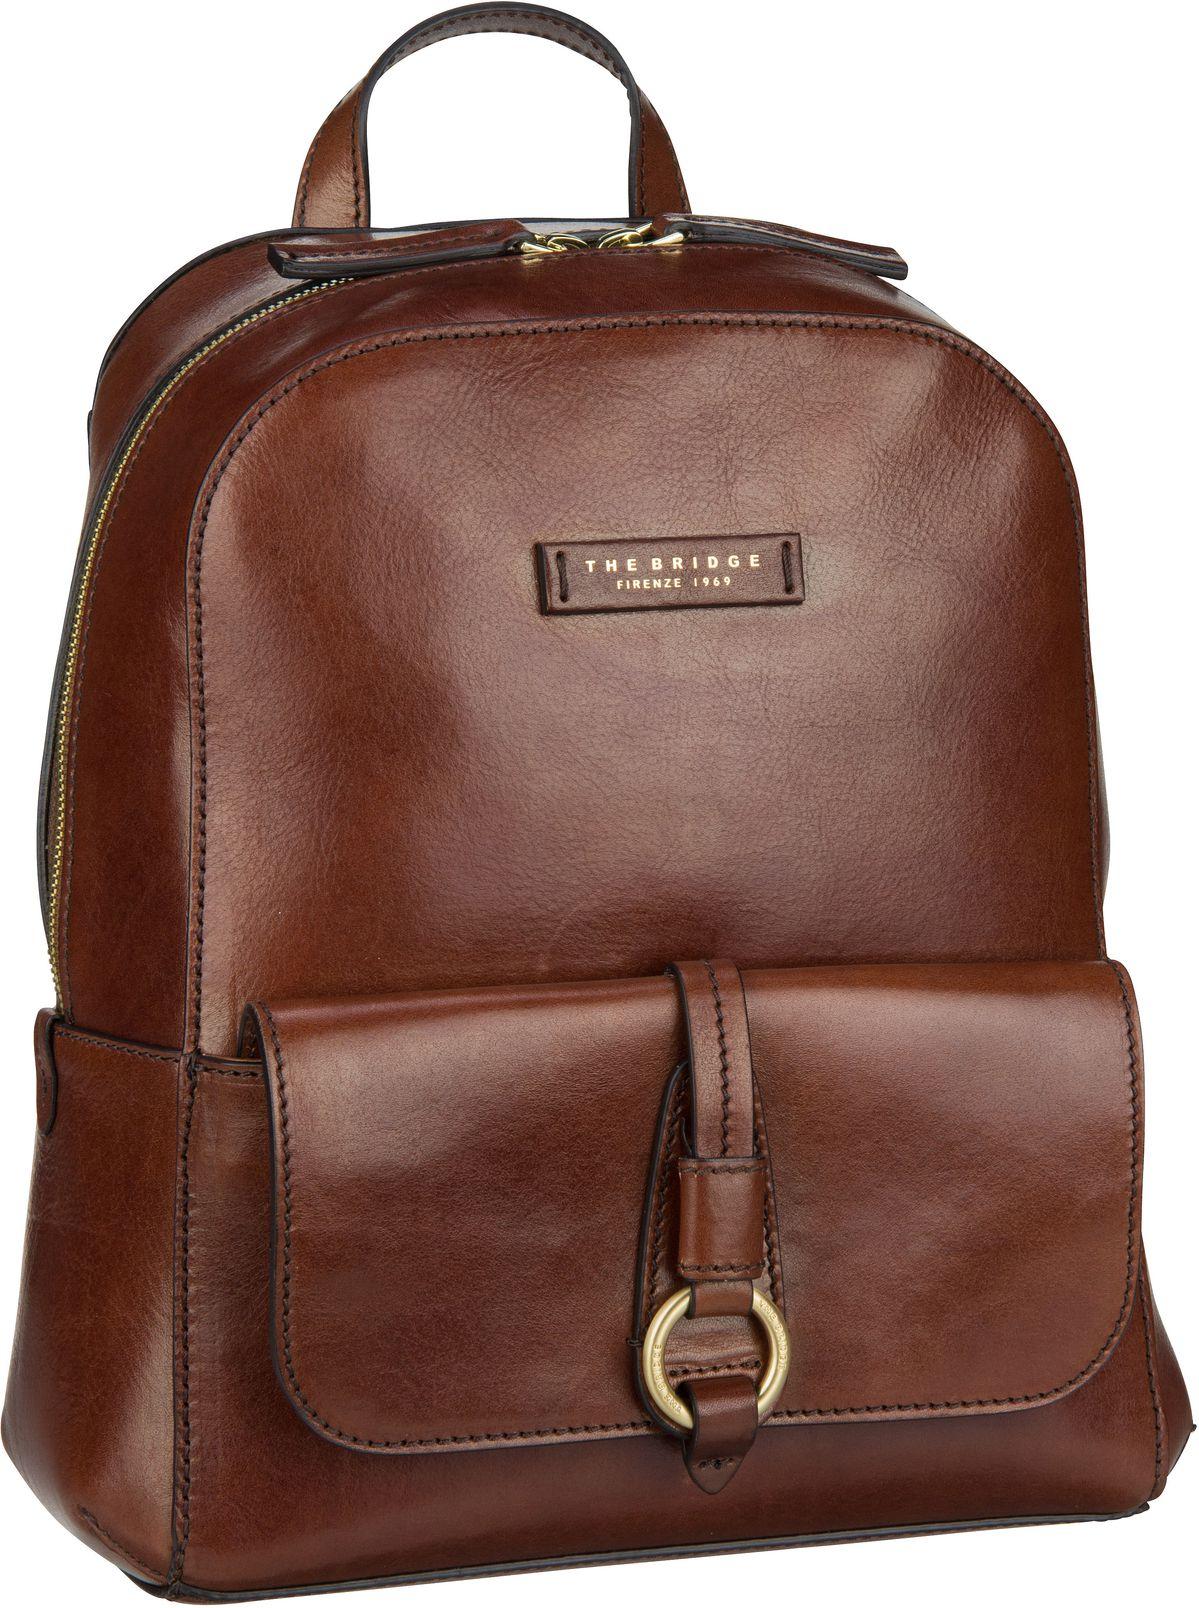 Rucksack / Daypack Strozzi 3820 Marrone/Oro